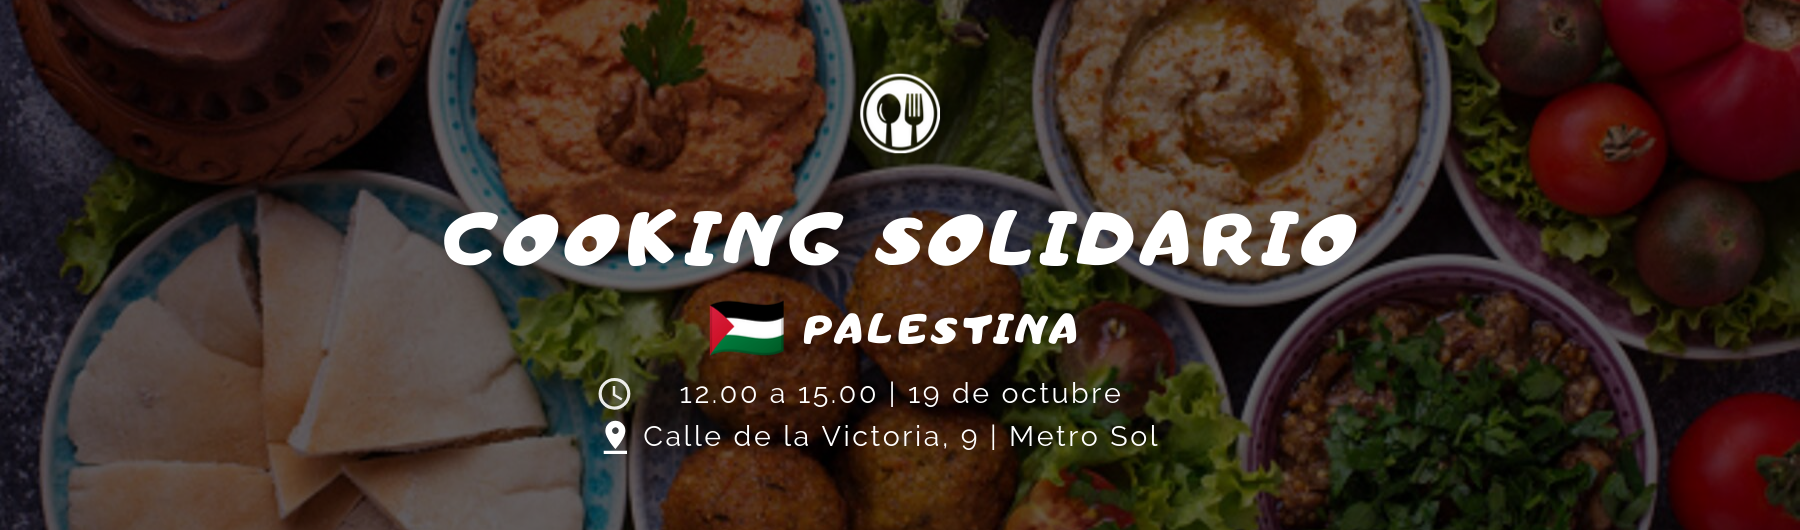 Clase de cocina solidaria palestina